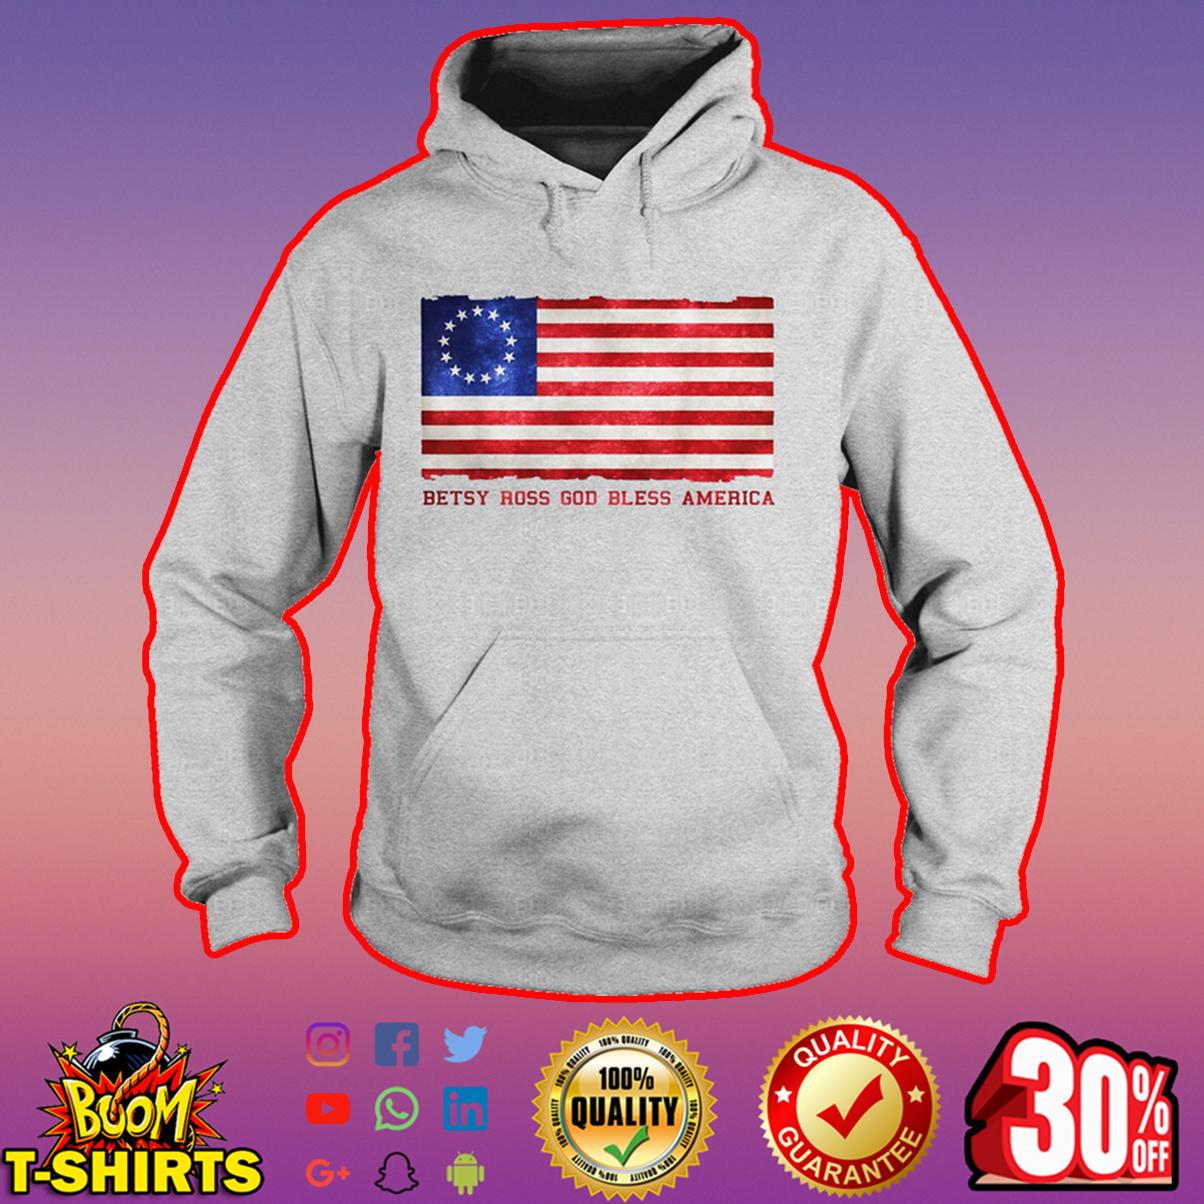 Betsy Ross God bless America hoodie